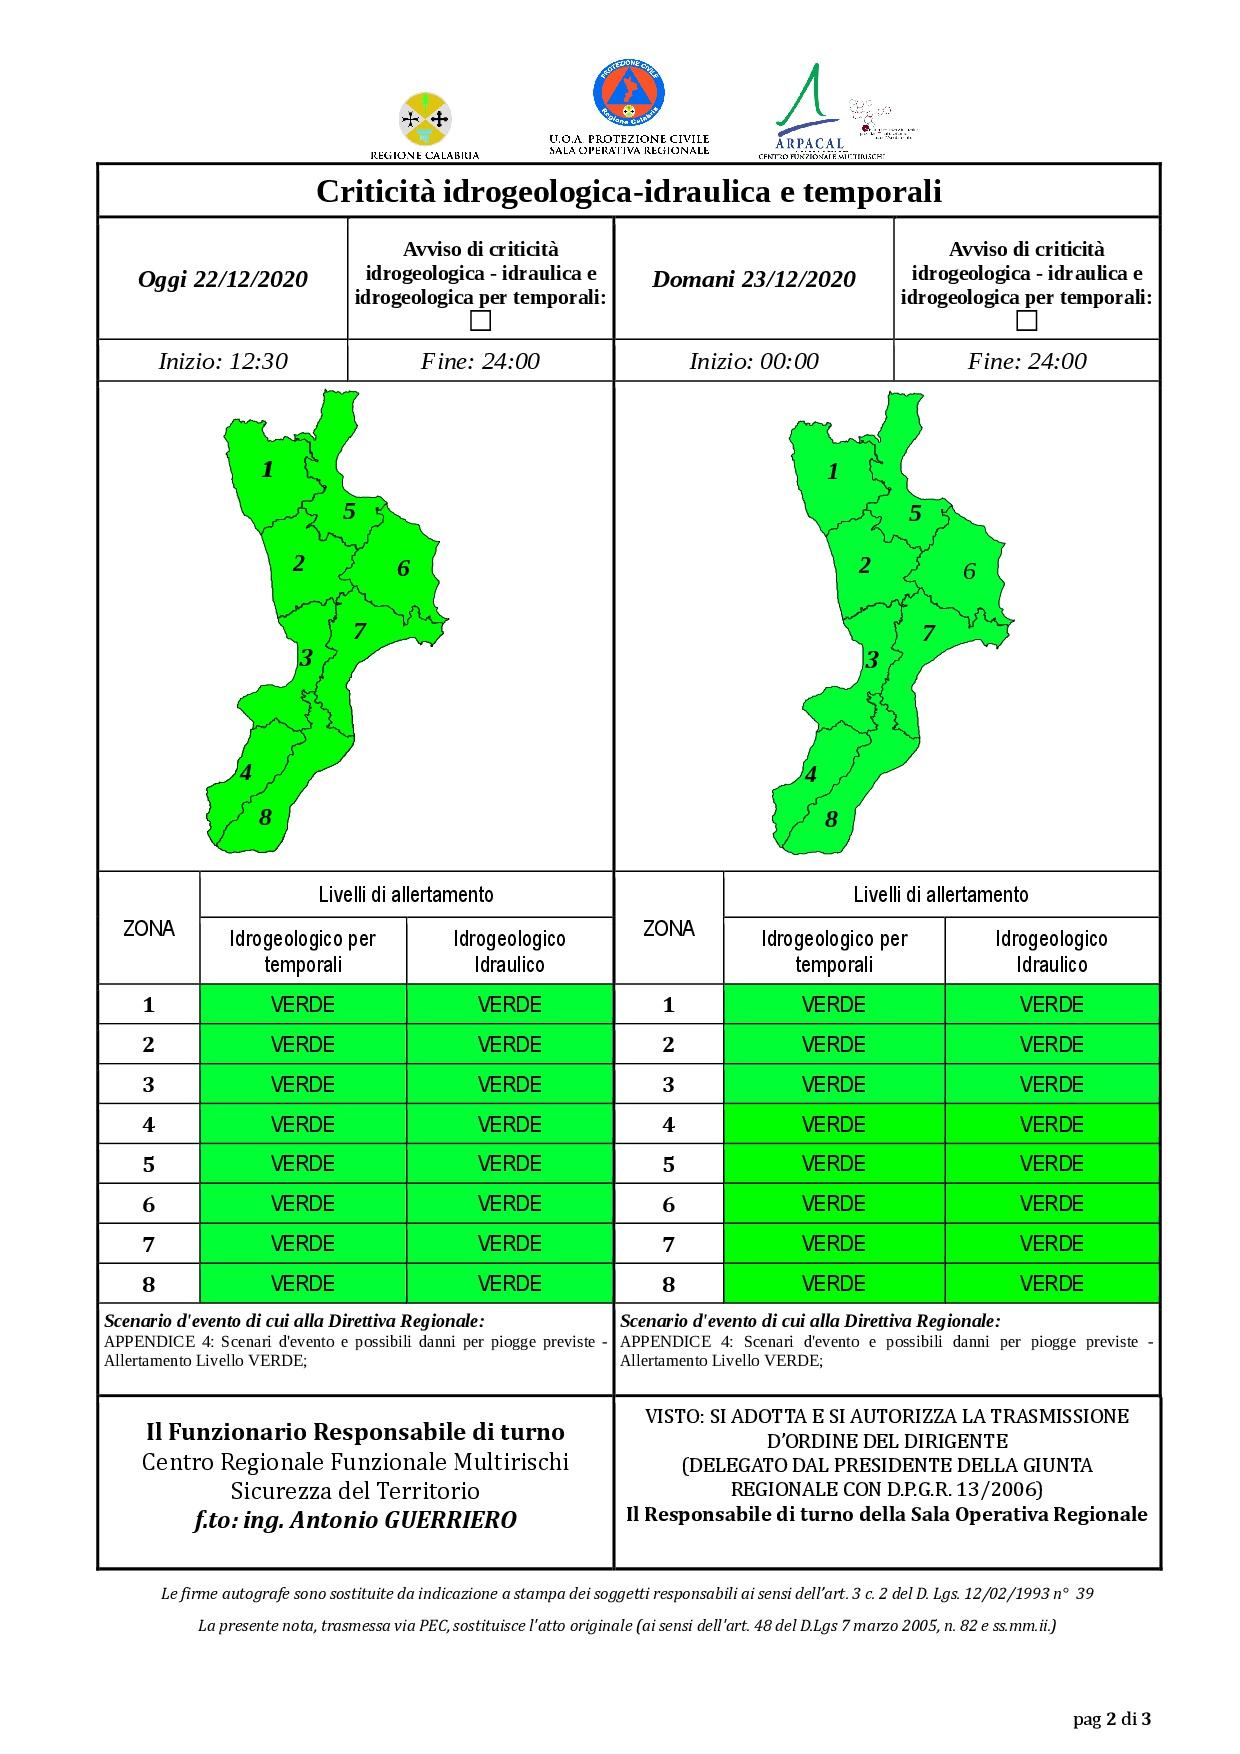 Criticità idrogeologica-idraulica e temporali in Calabria 22-12-2020